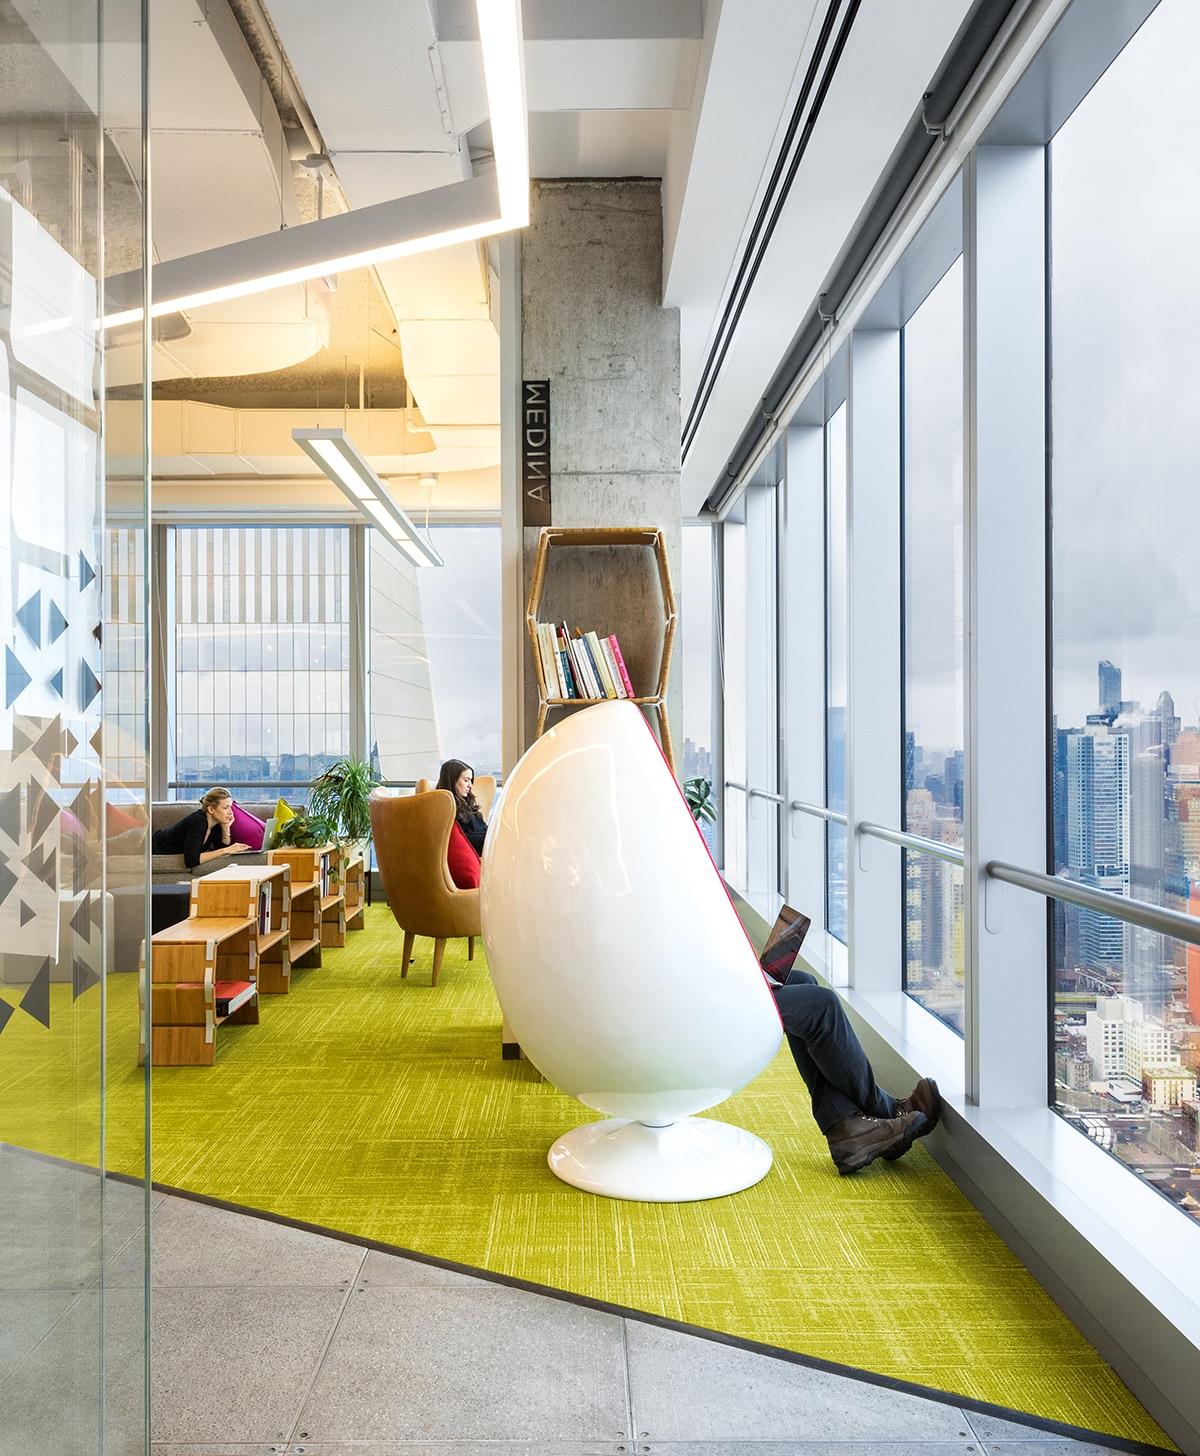 bcg-digital-ventures-office-7